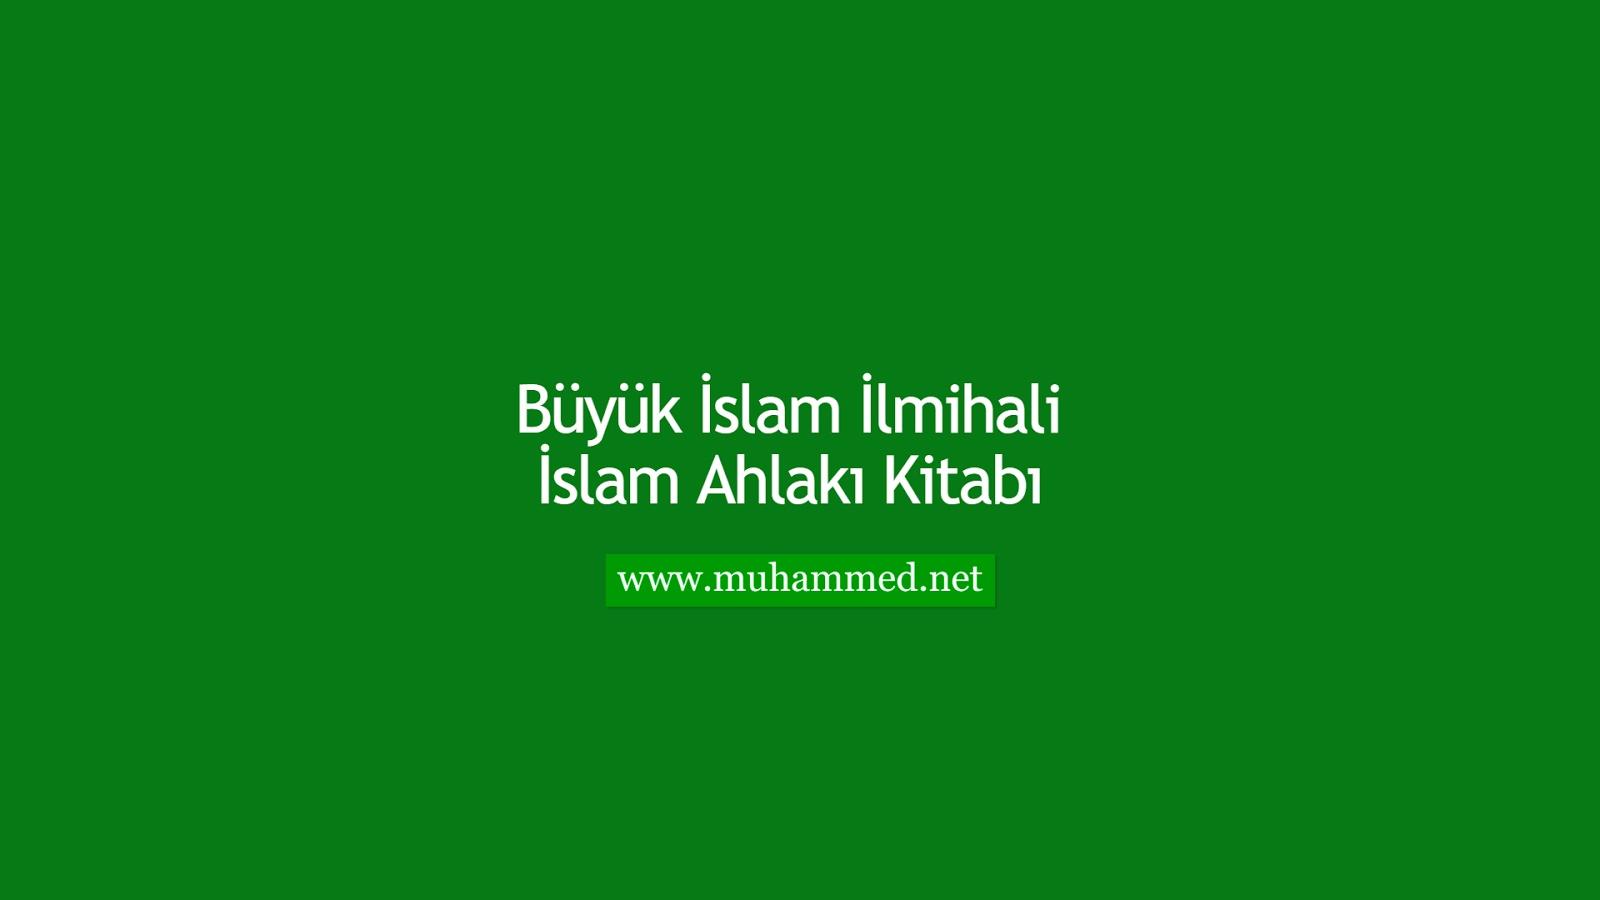 İlmihal - İslam Ahlakı Kitabı